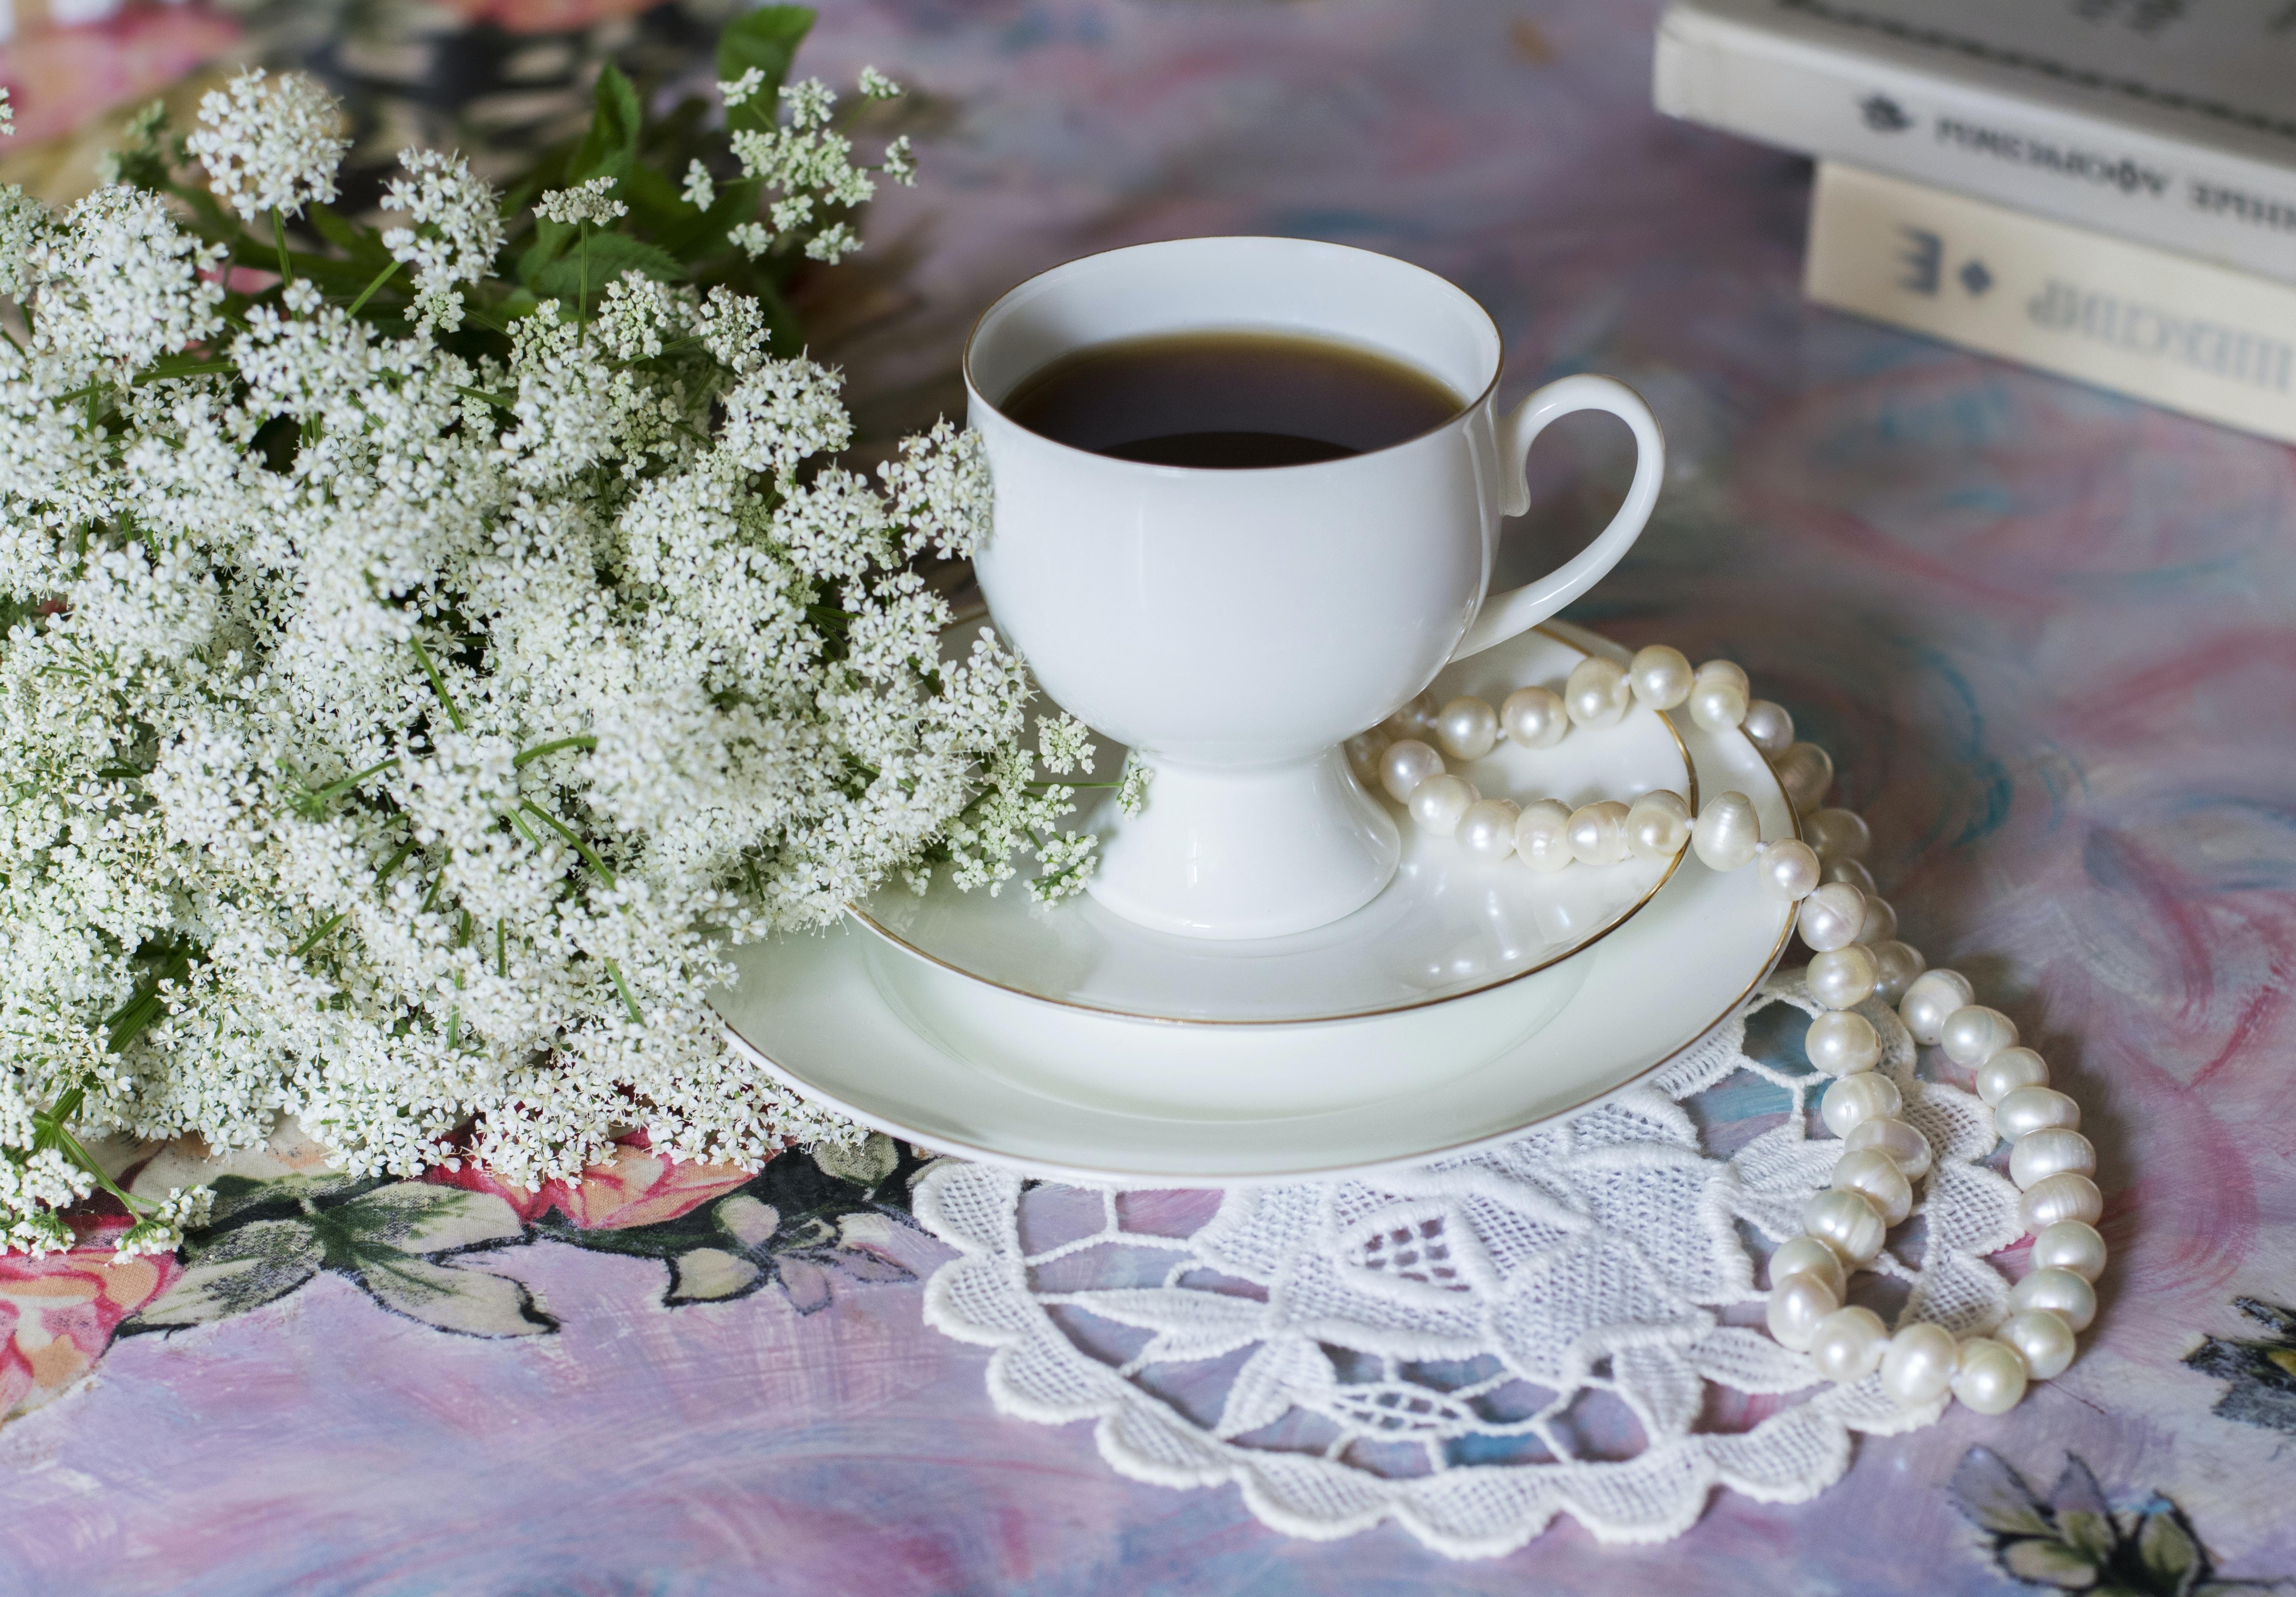 white ceramic cup on ceramic saucer